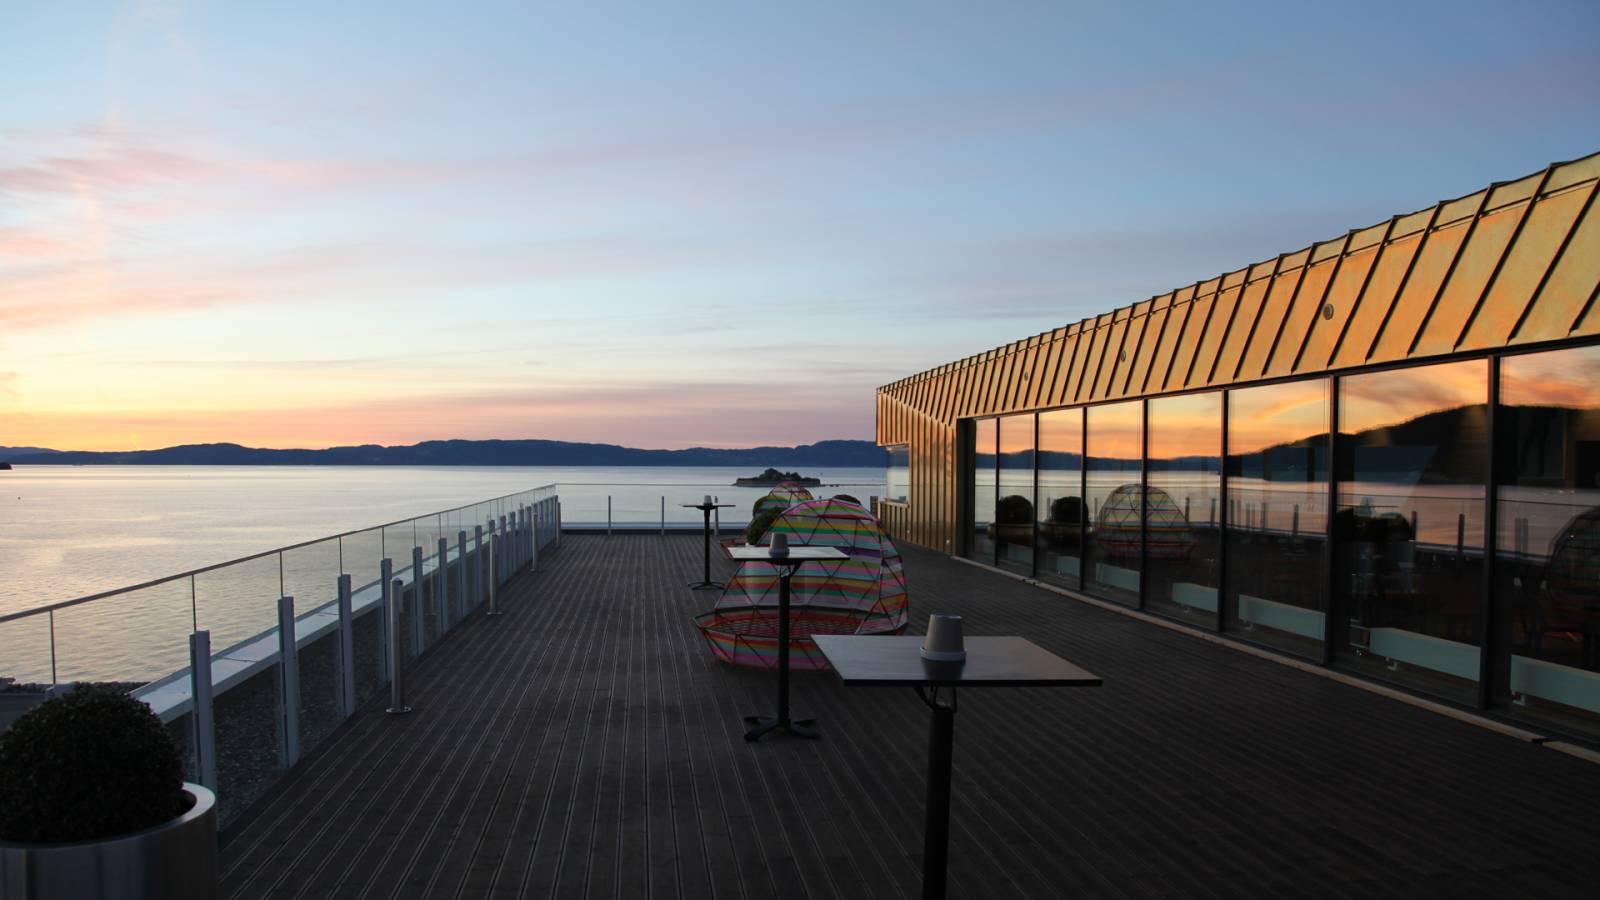 SKY BAR TERRACE - Clarion Hotel & Congress - SPOL Architects